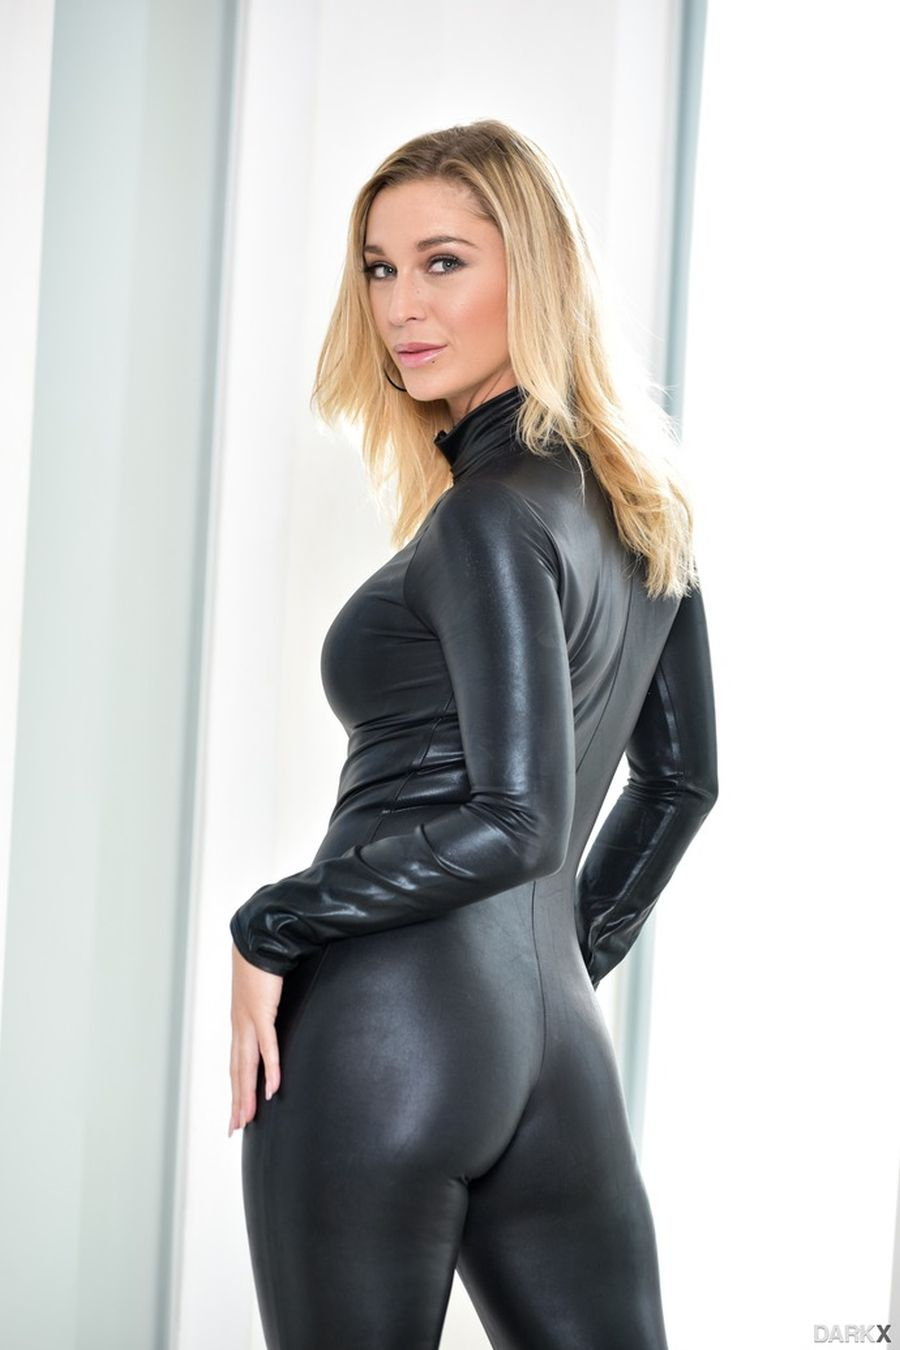 Strakke latex bodysuit